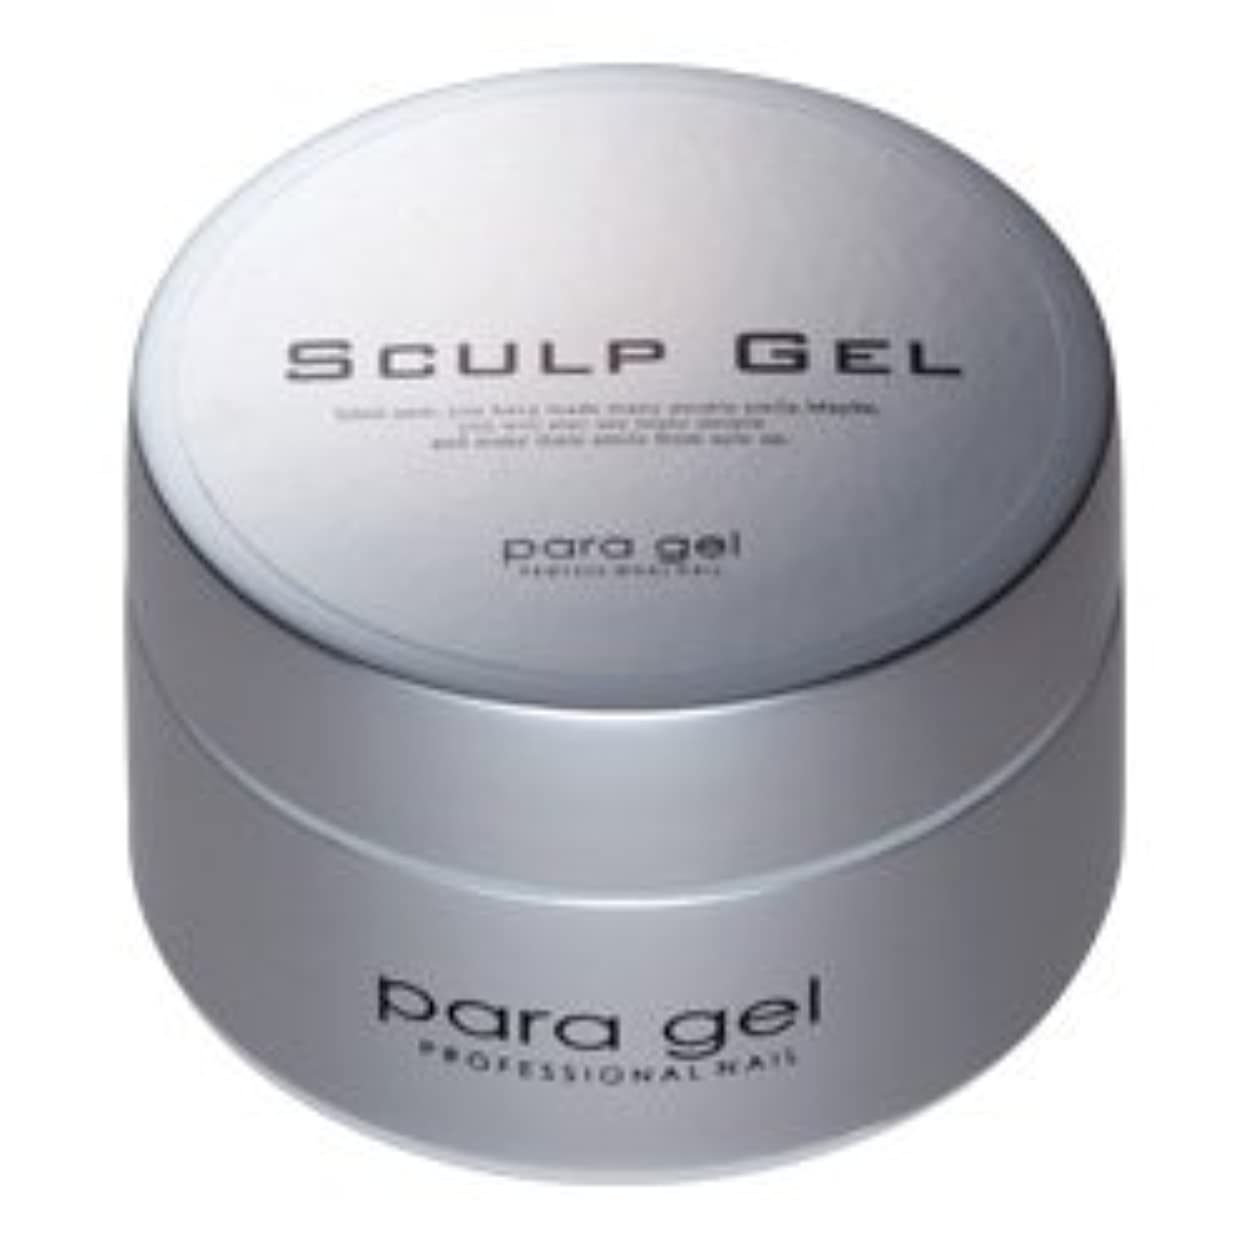 ★para gel(パラジェル) <BR>スカルプジェル 10g